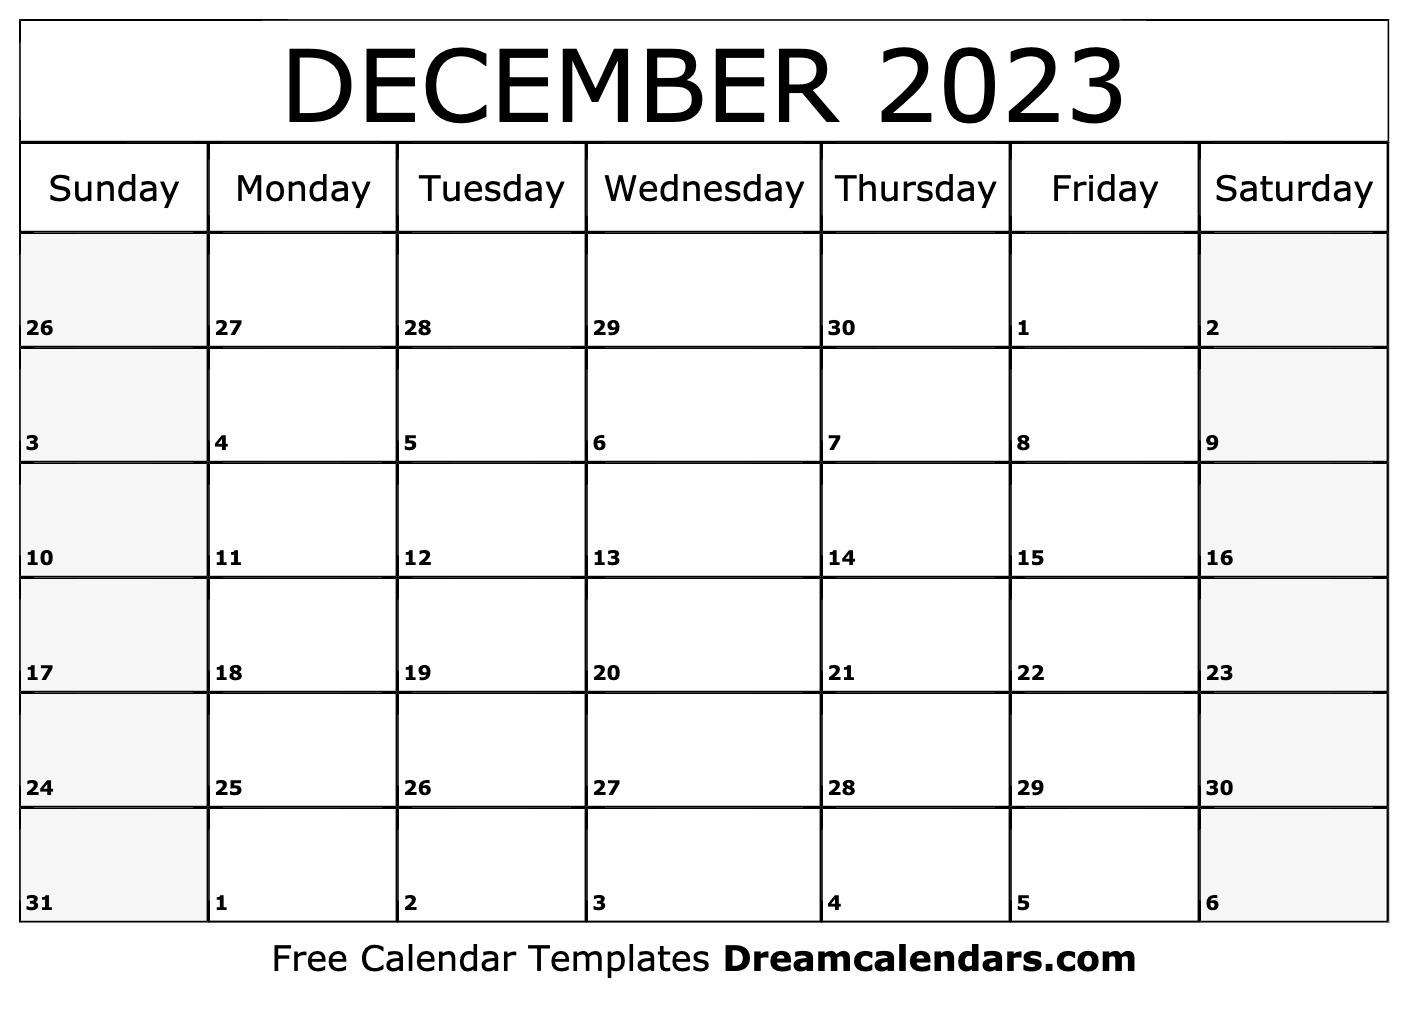 December 2023 And January 2022 Calendar.December 2023 Calendar Free Blank Printable Templates